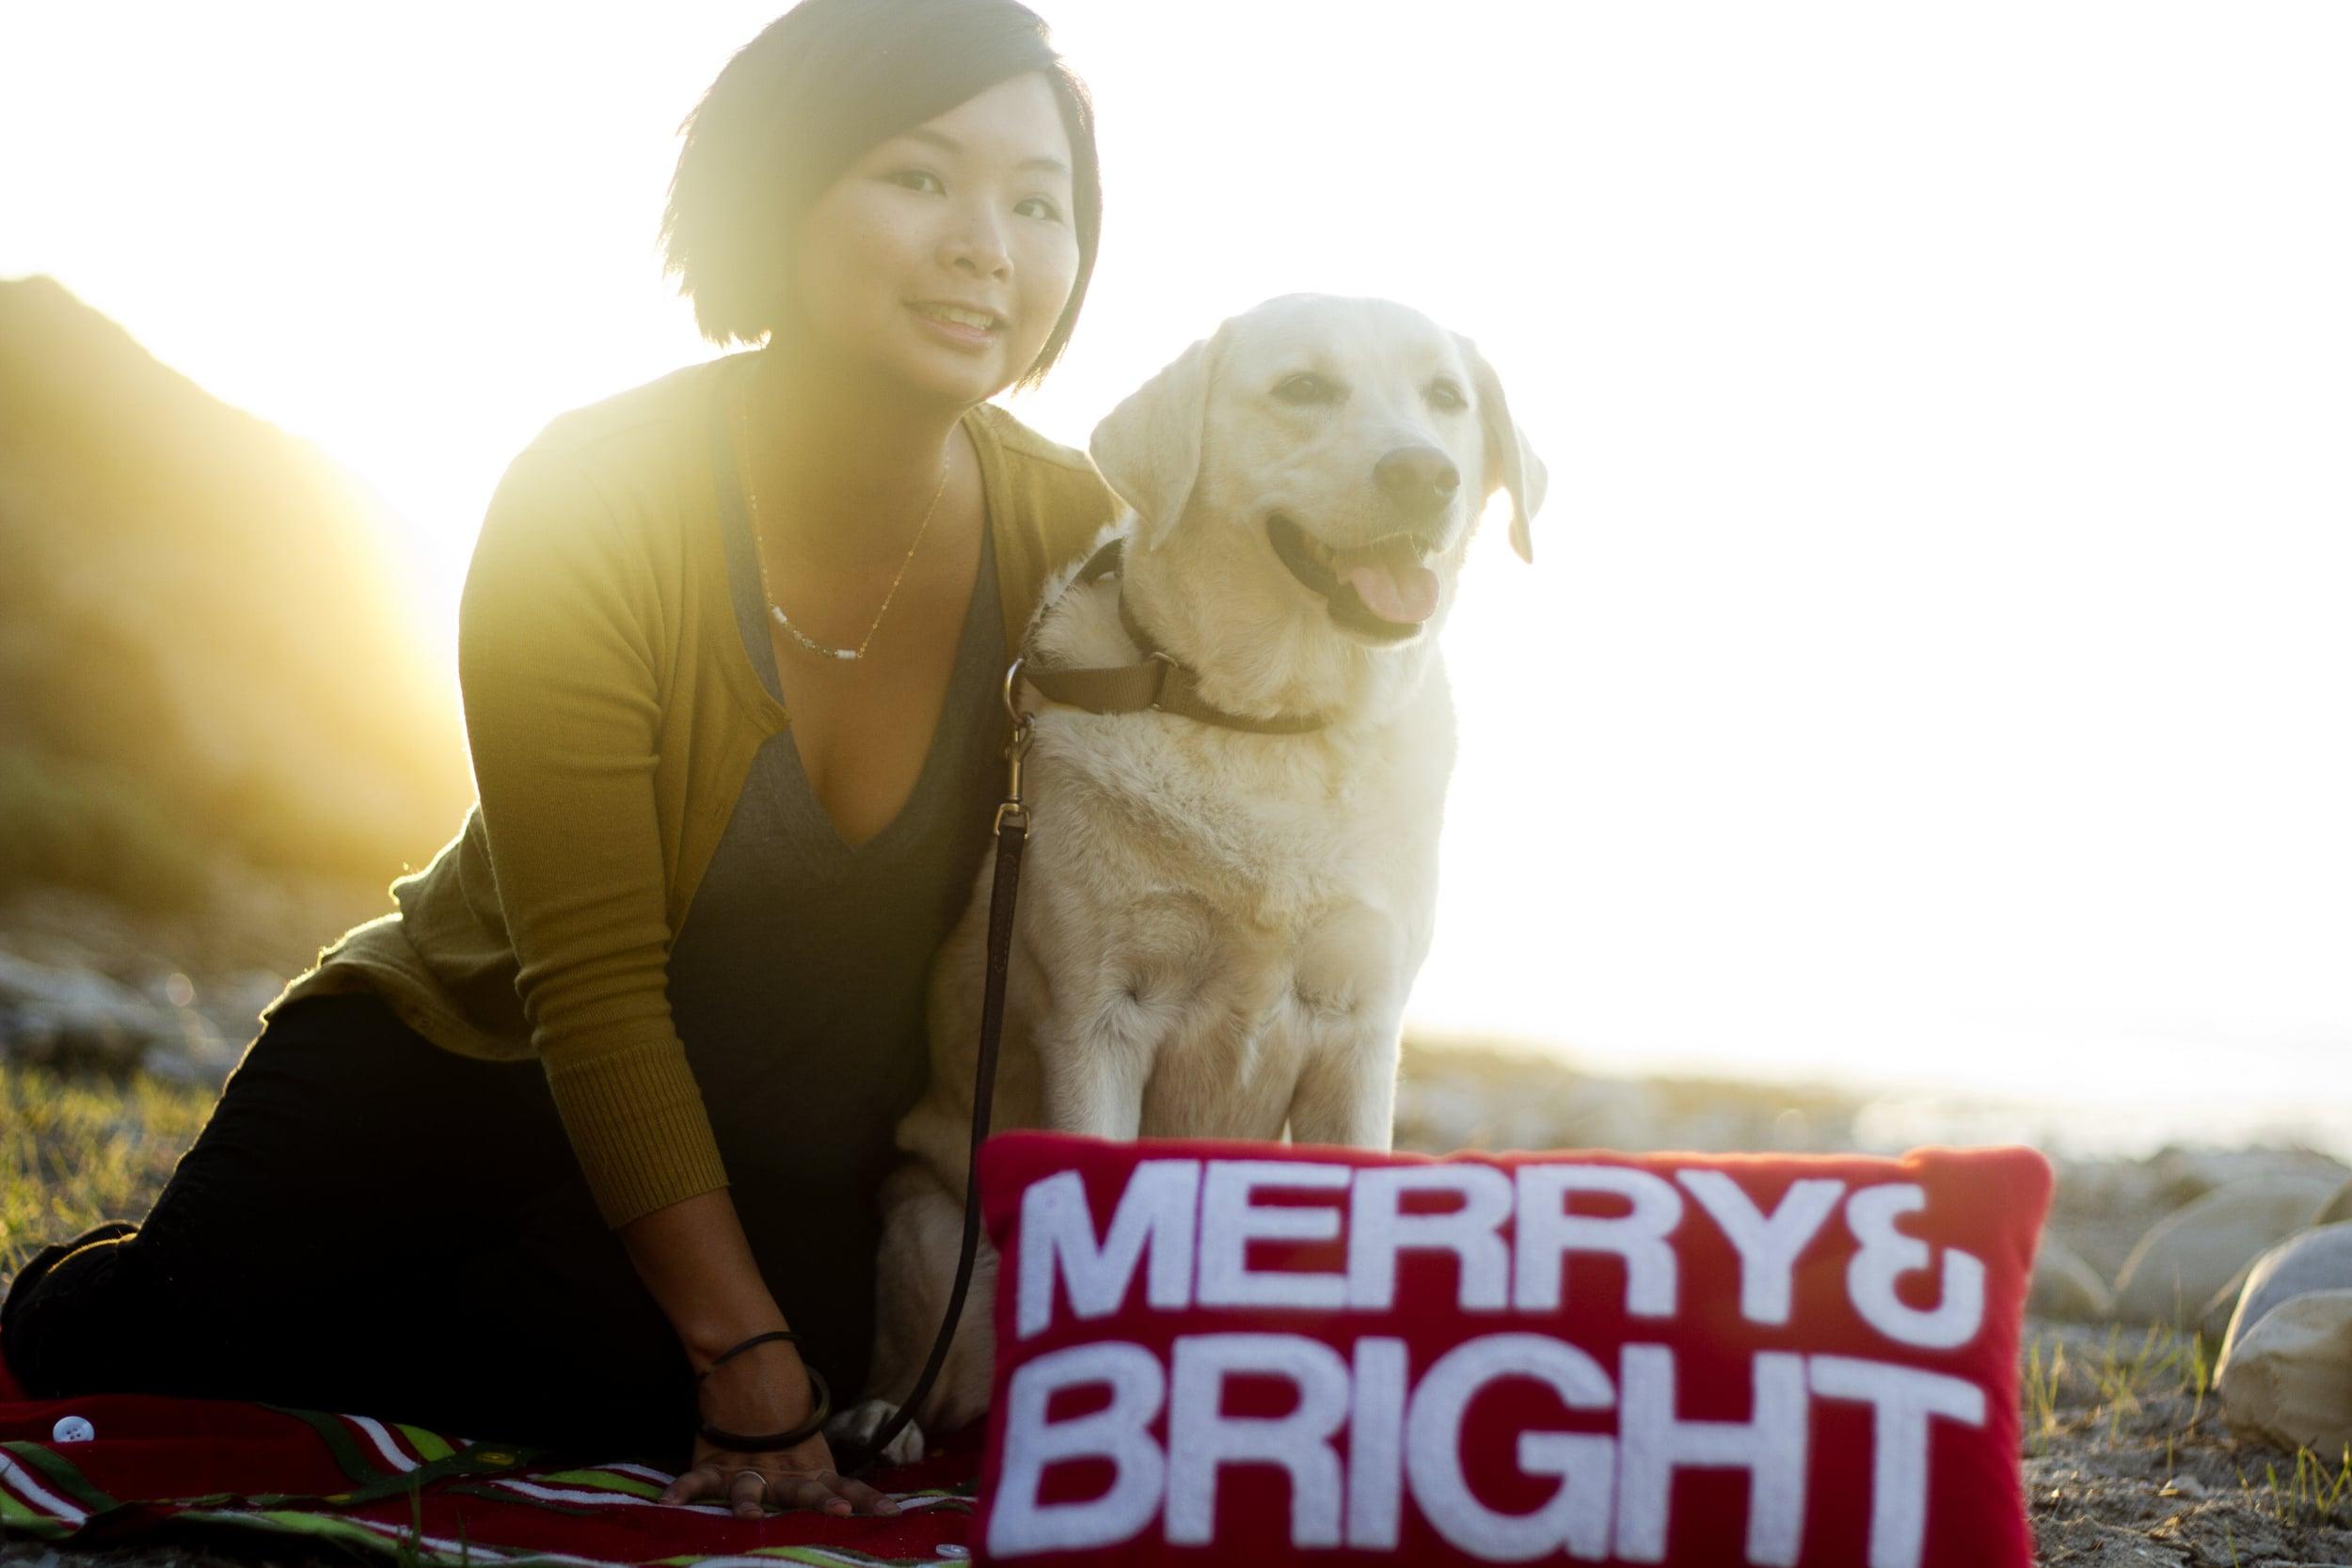 Jenny Mochi November 2014-Jenny Mochi November 2014-0034.jpg